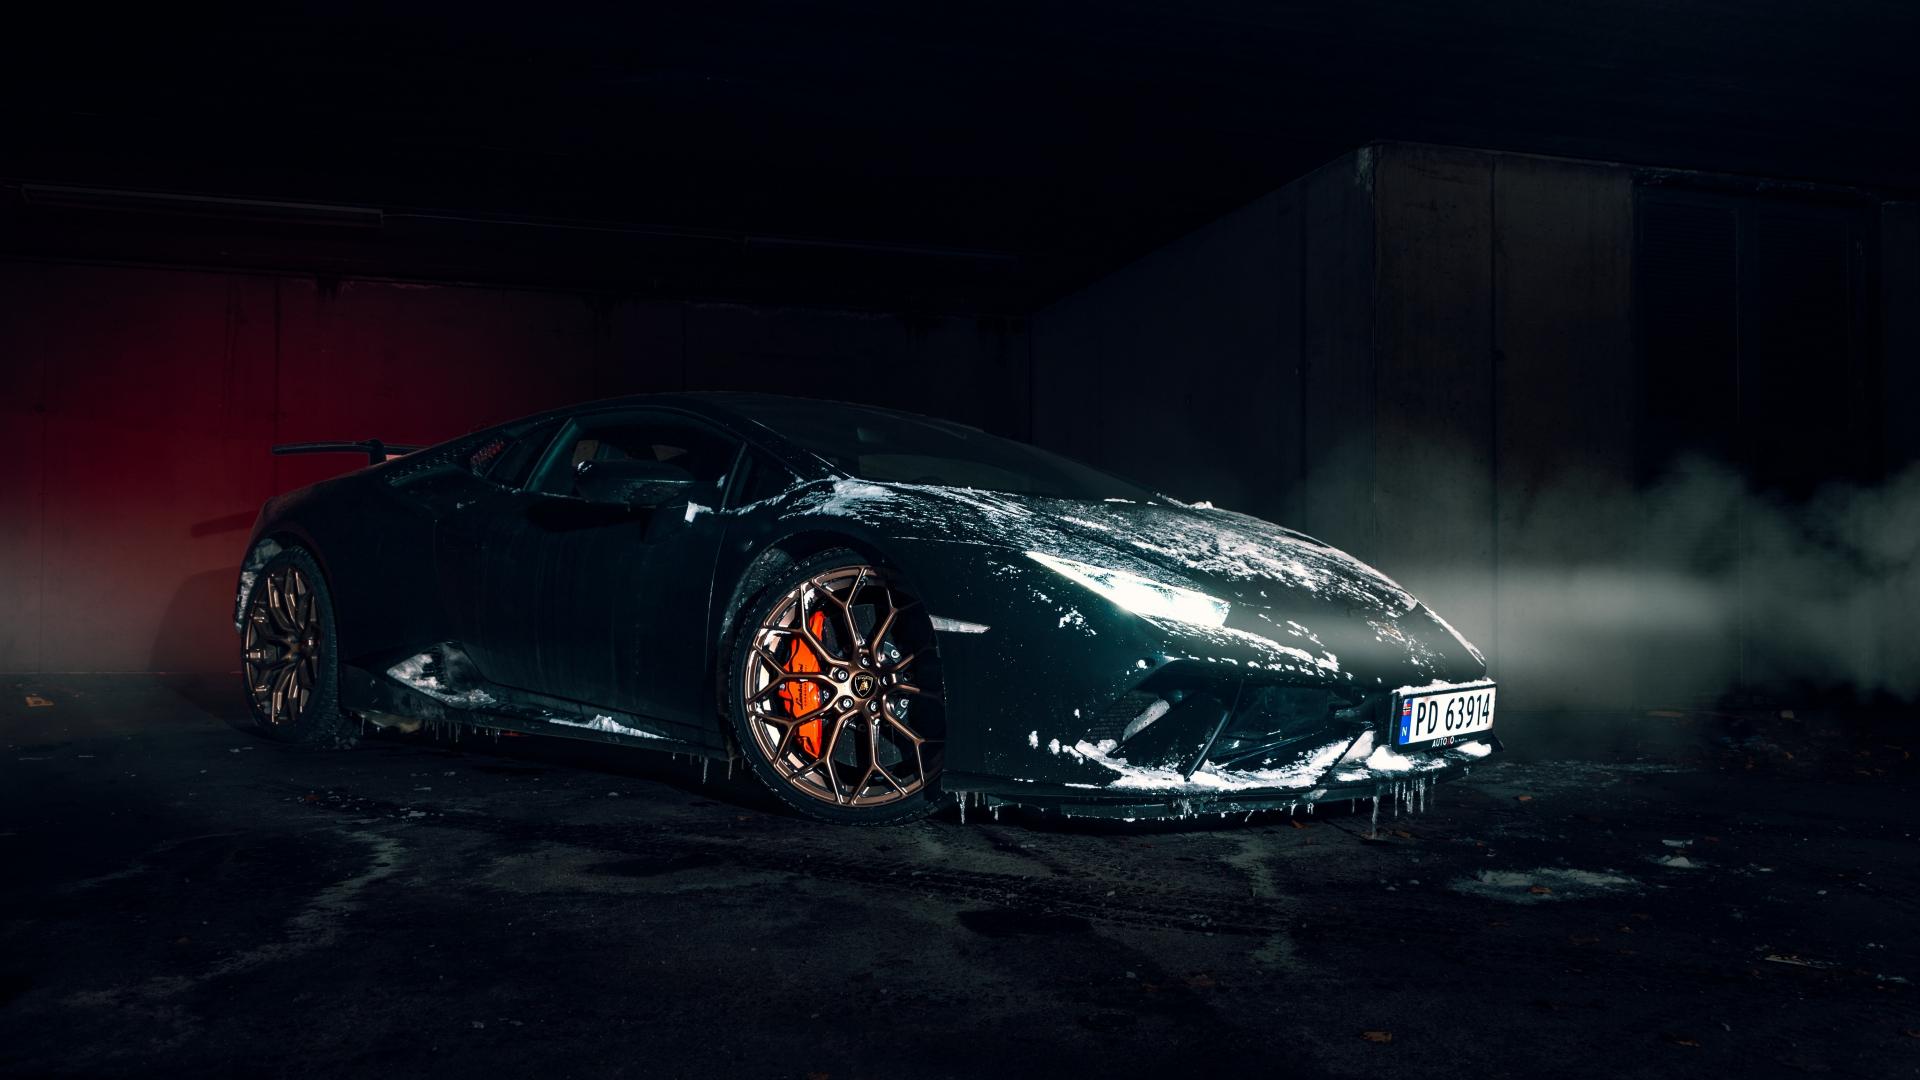 Download 1920x1080 Wallpaper Lamborghini Aventador Black